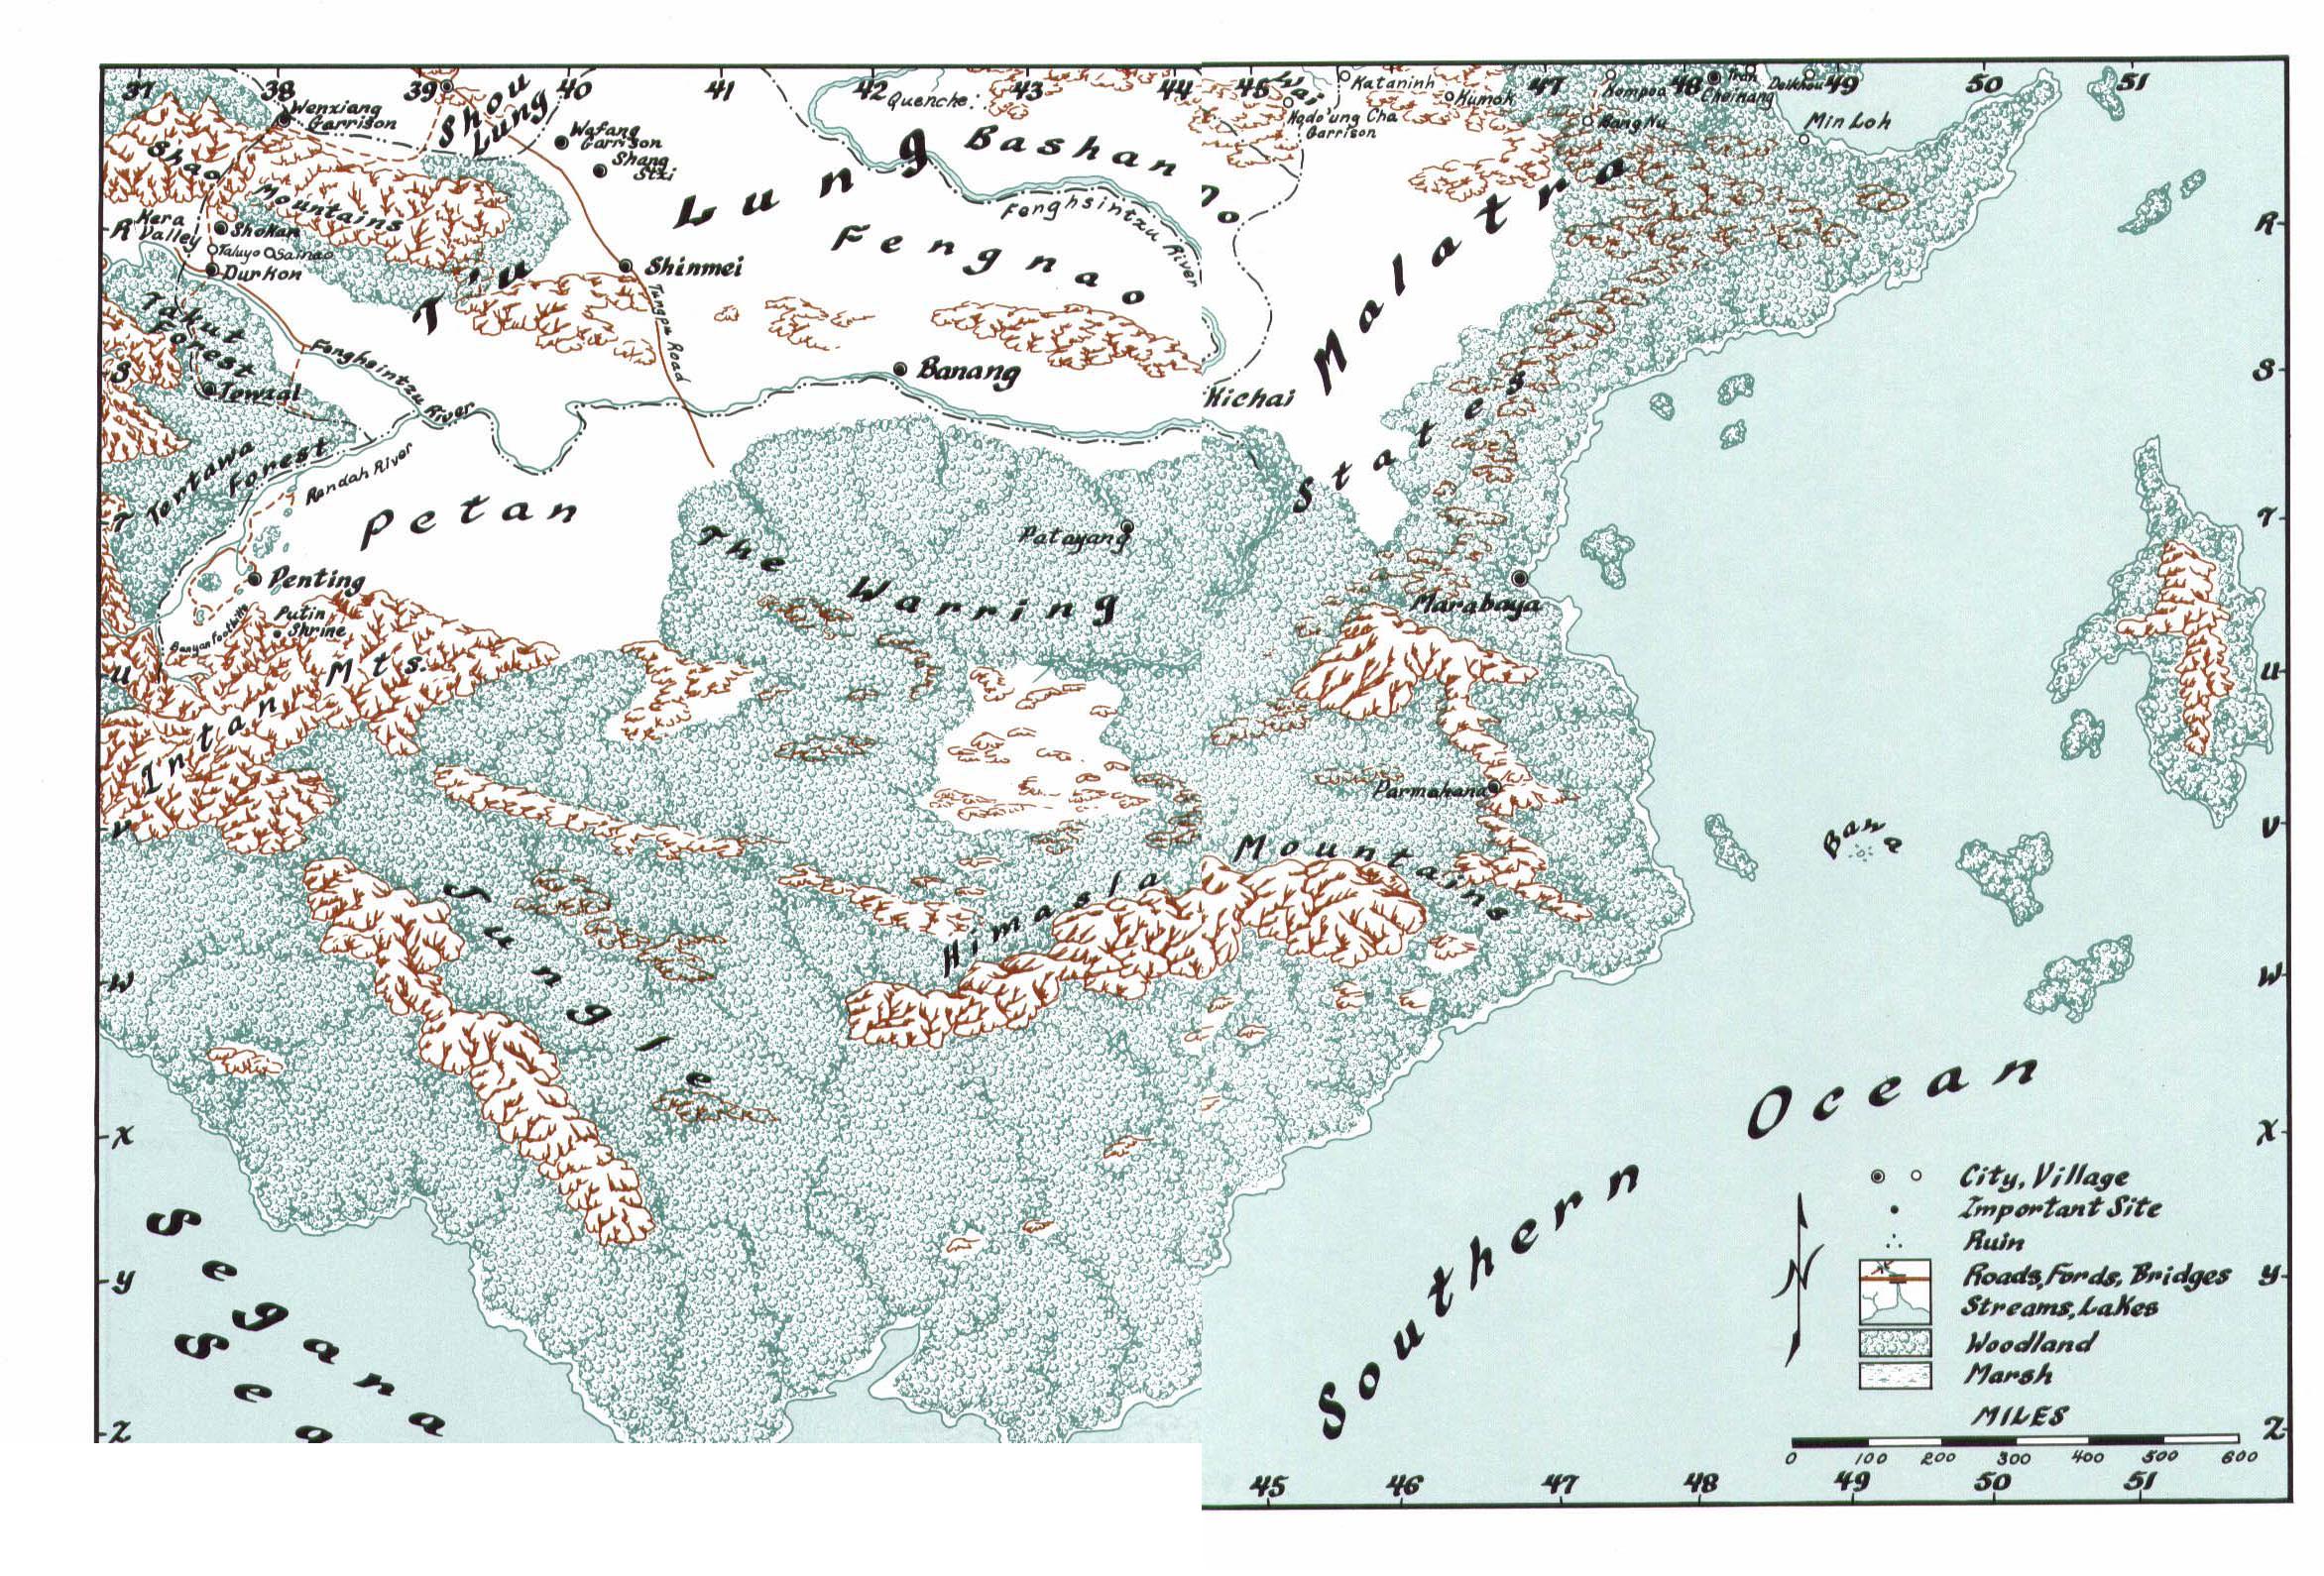 Kara Map on laptev sea map, history map, korea map, forgotten realms world map, sugar map, katrina map, front-runner map, north gyeongsang map, kashmir map, step map, mind map, origins of sikhism map, co co map, north sea map, asir map,